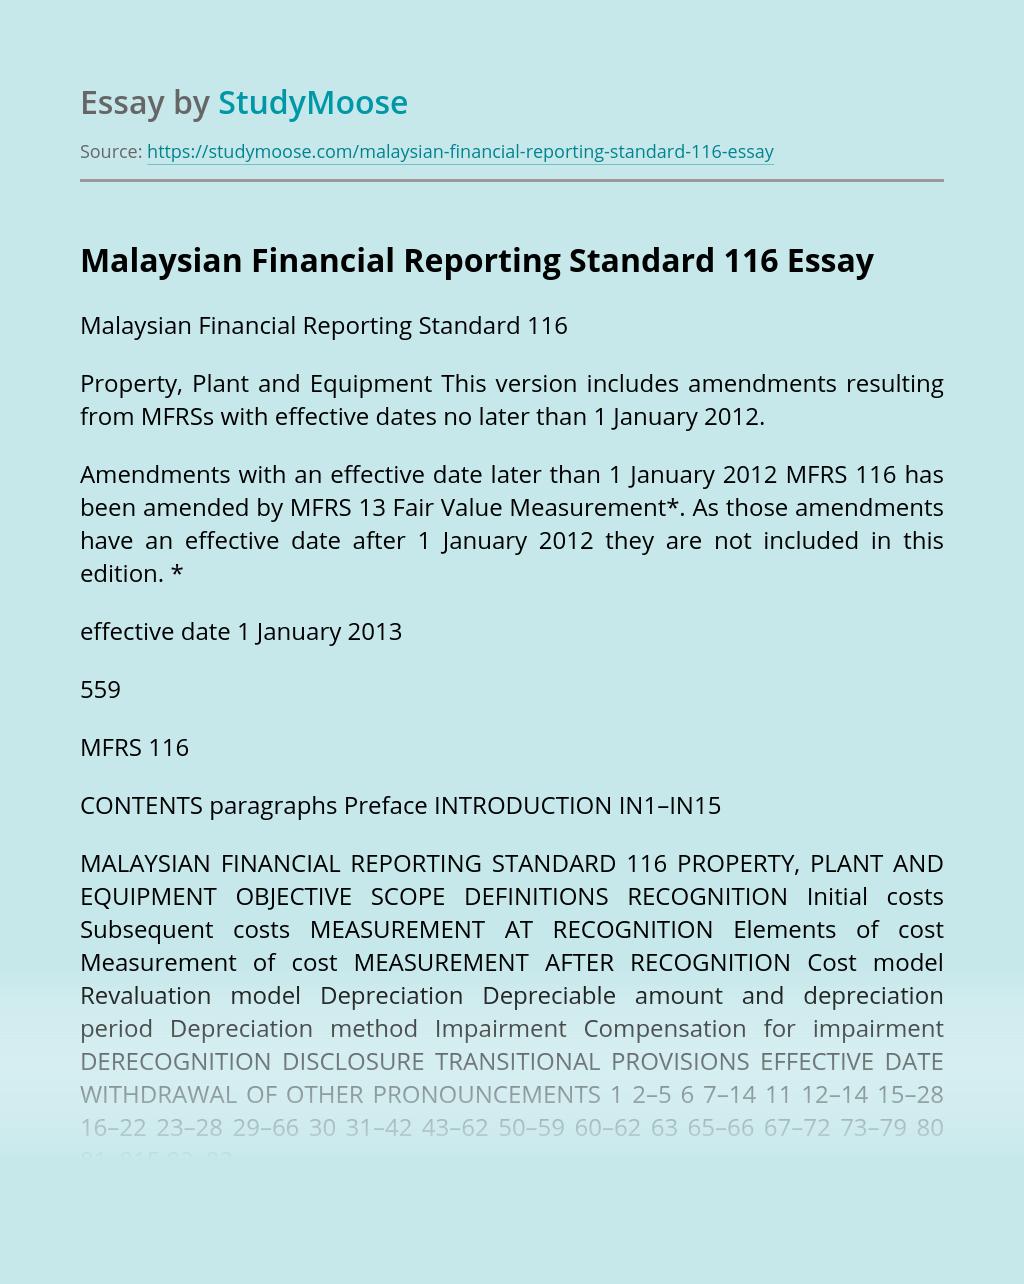 Malaysian Financial Reporting Standard 116